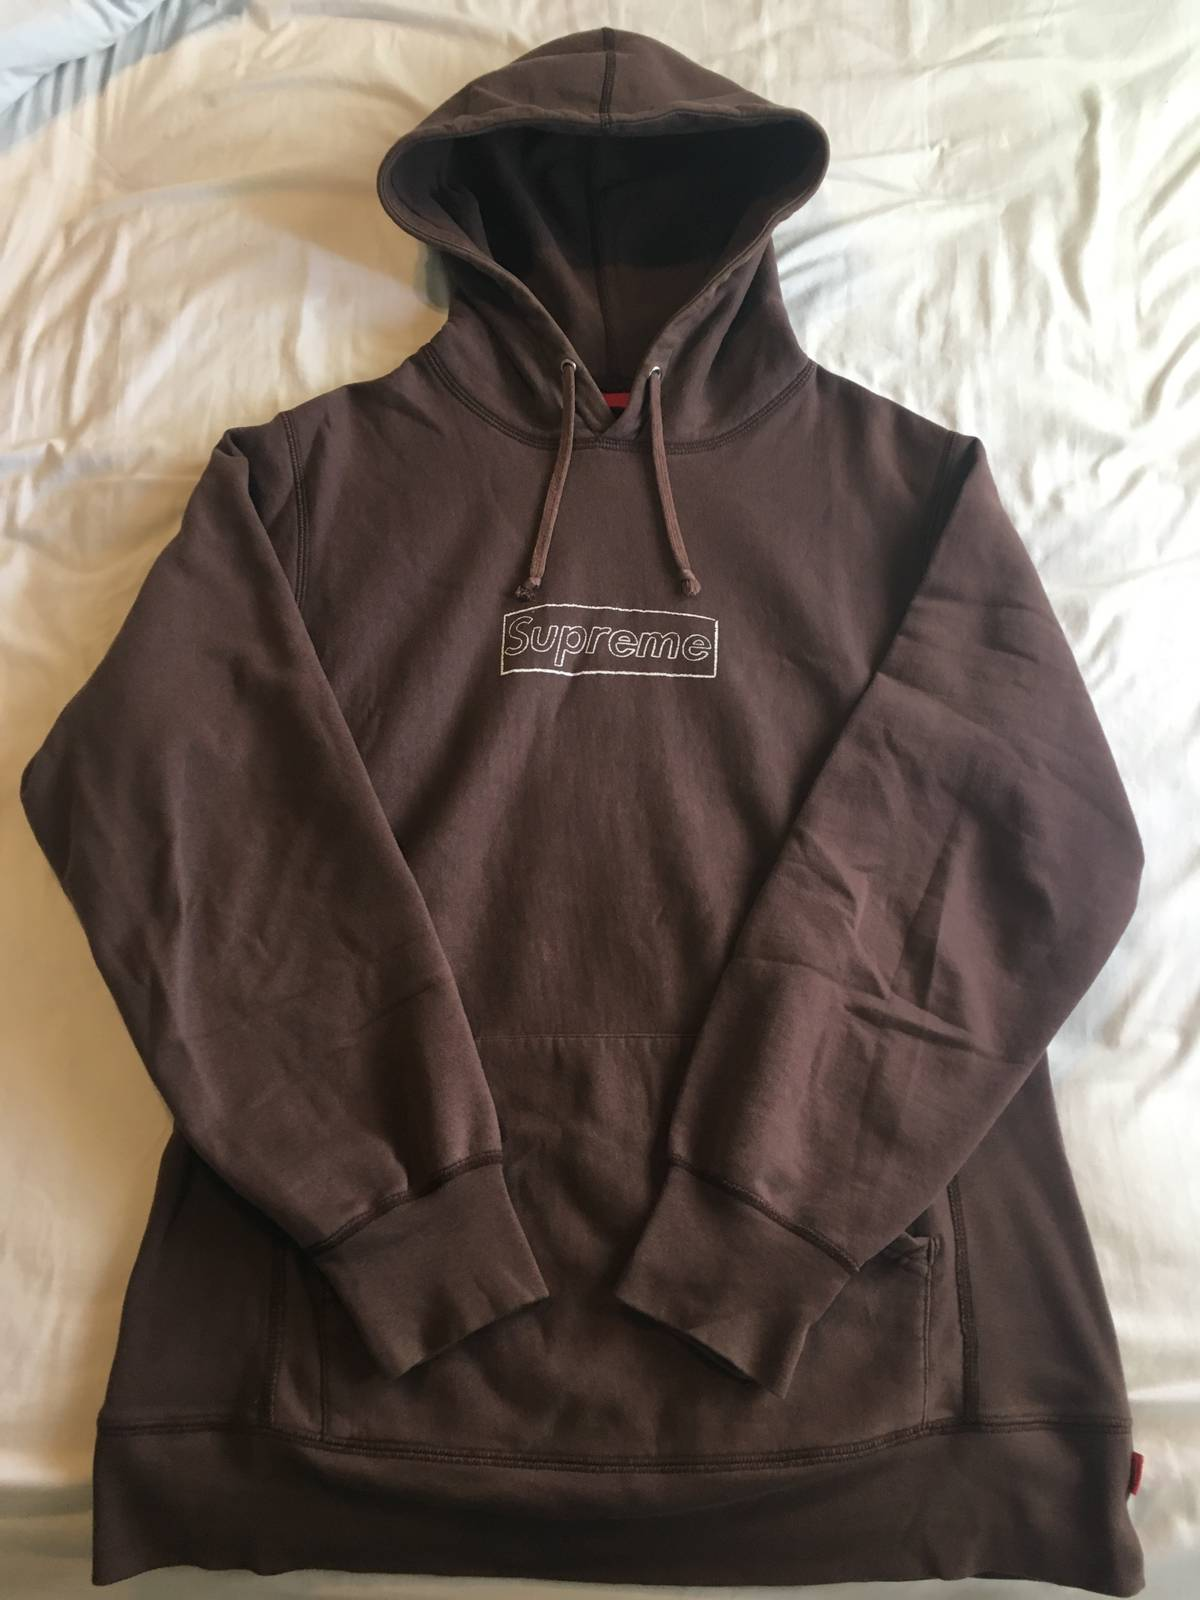 Supreme hoodie for sale